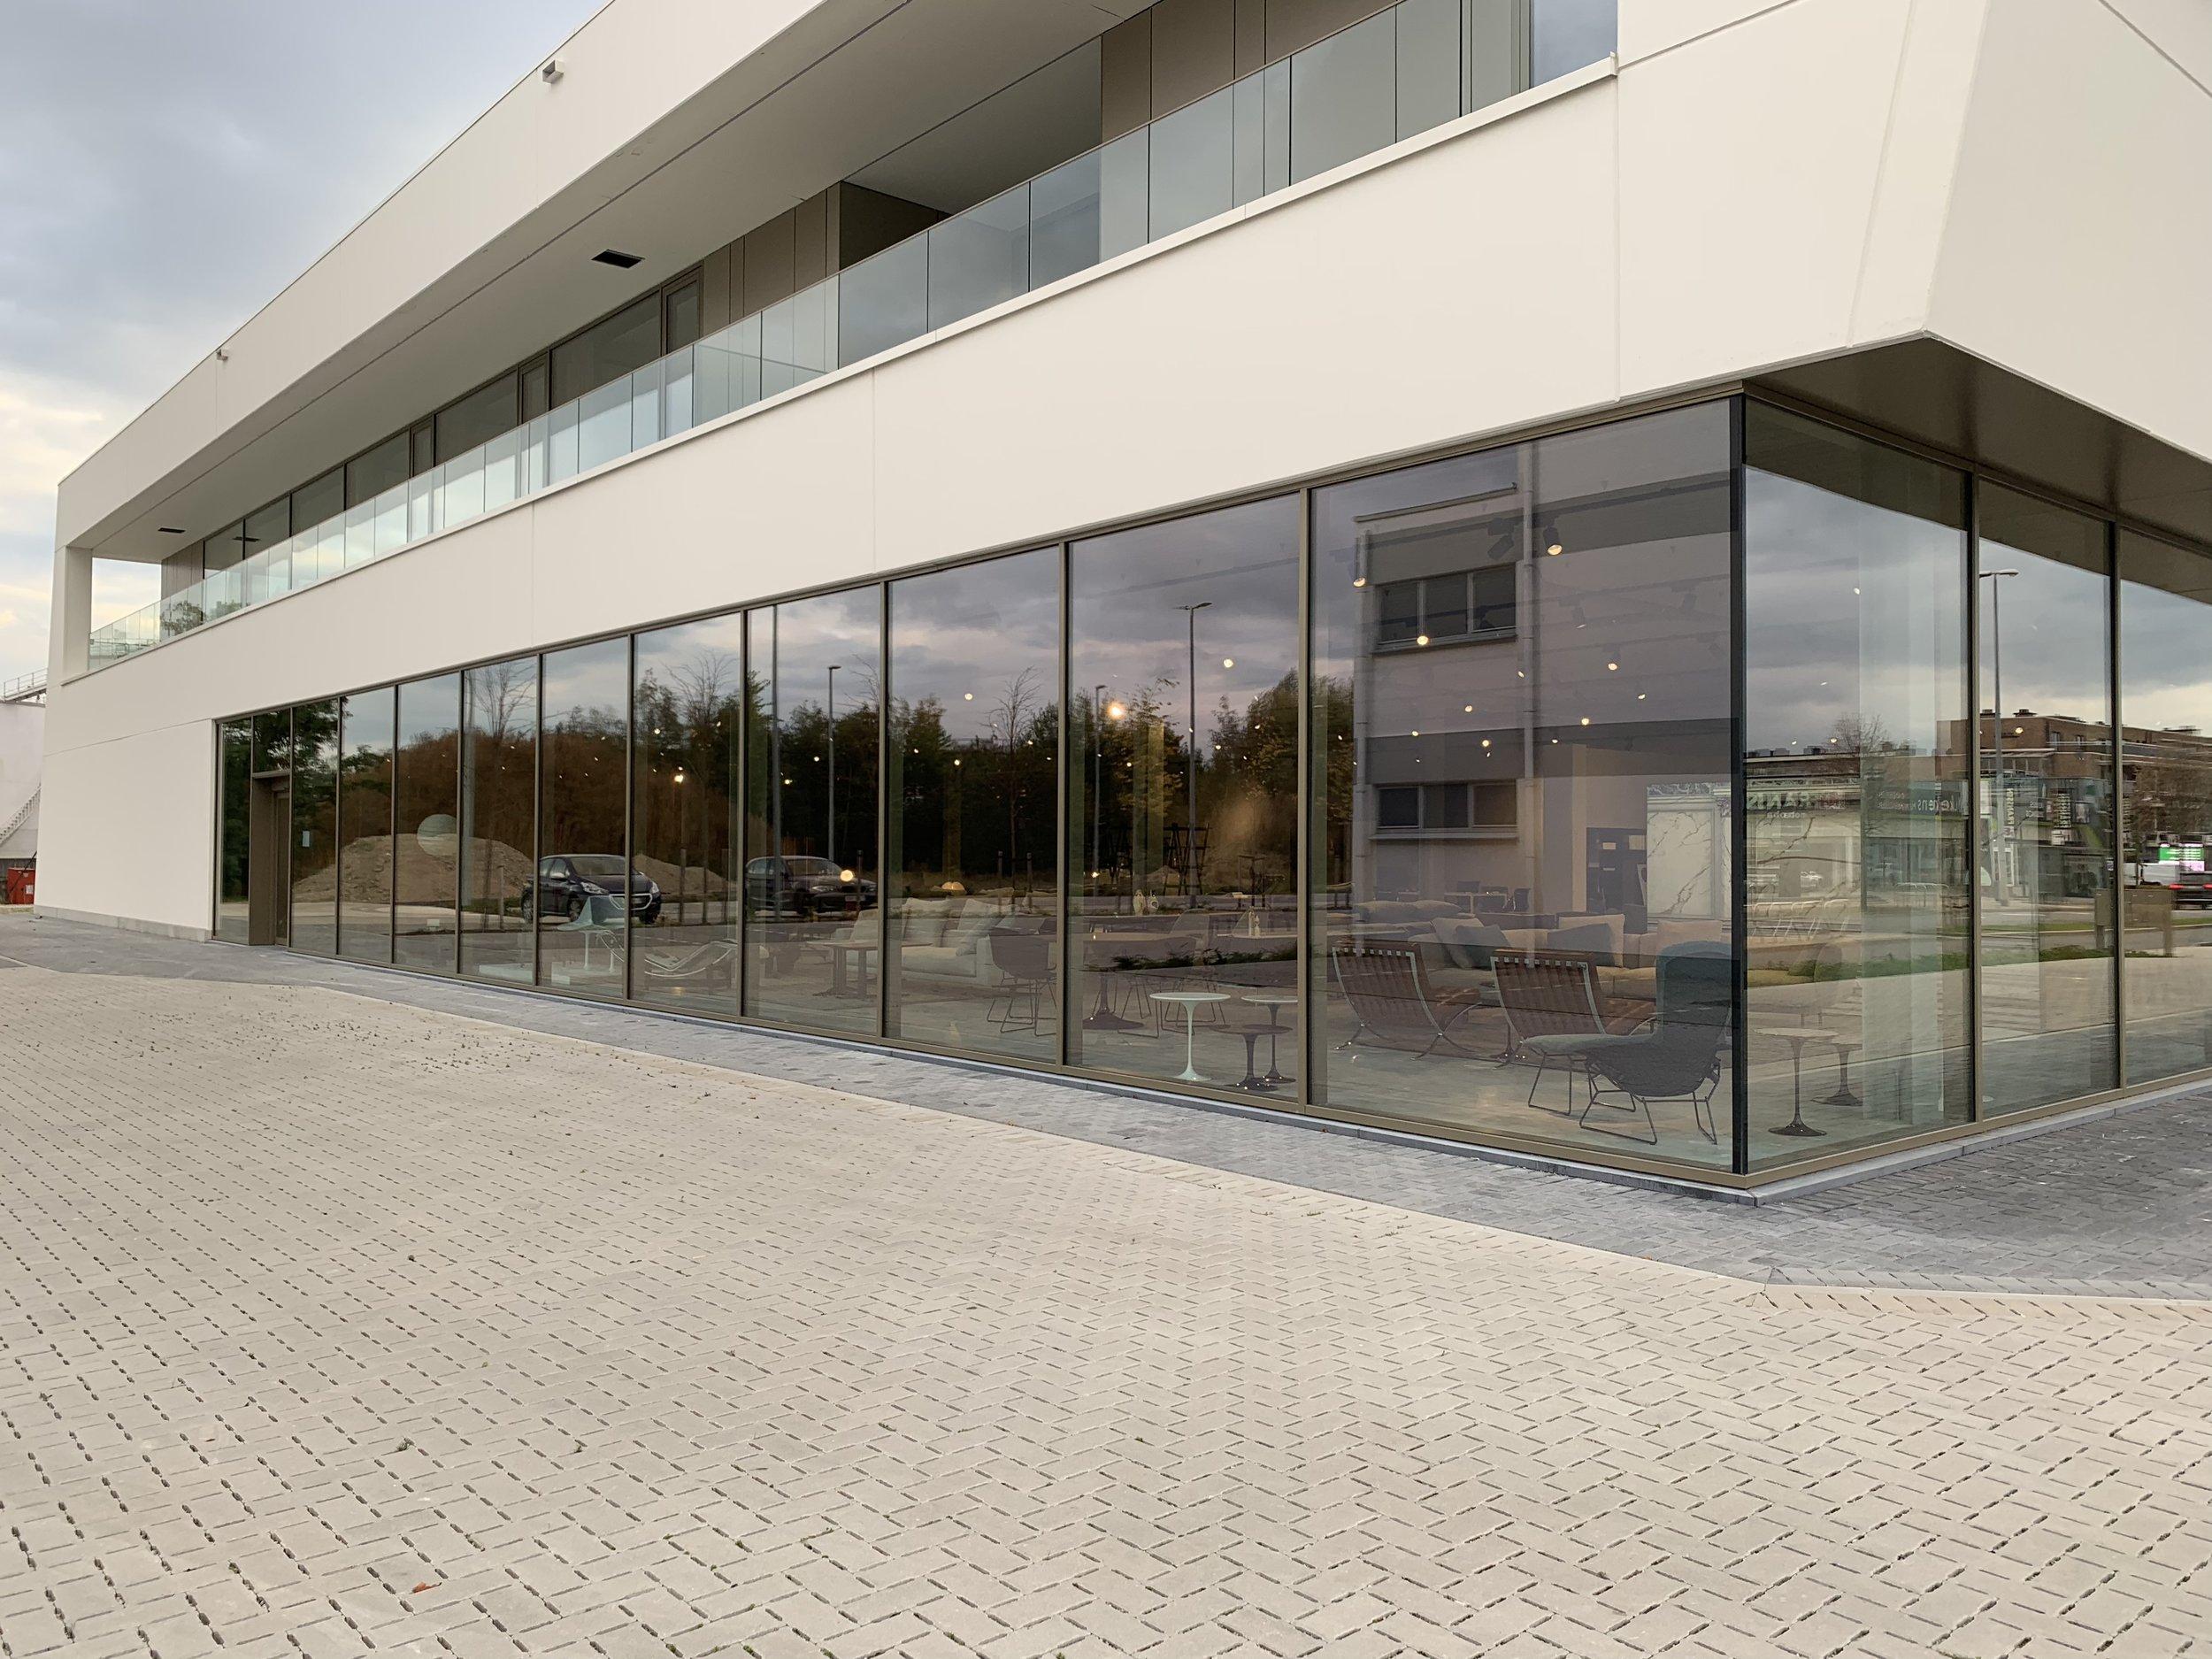 Loncin designmeubelwinkel genkersteenweg 195 3500 Hasselt Vitra Molteni Cassina Flexform Knoll Cor Jori Ligne Roset interieur meubels Loncin .jpg